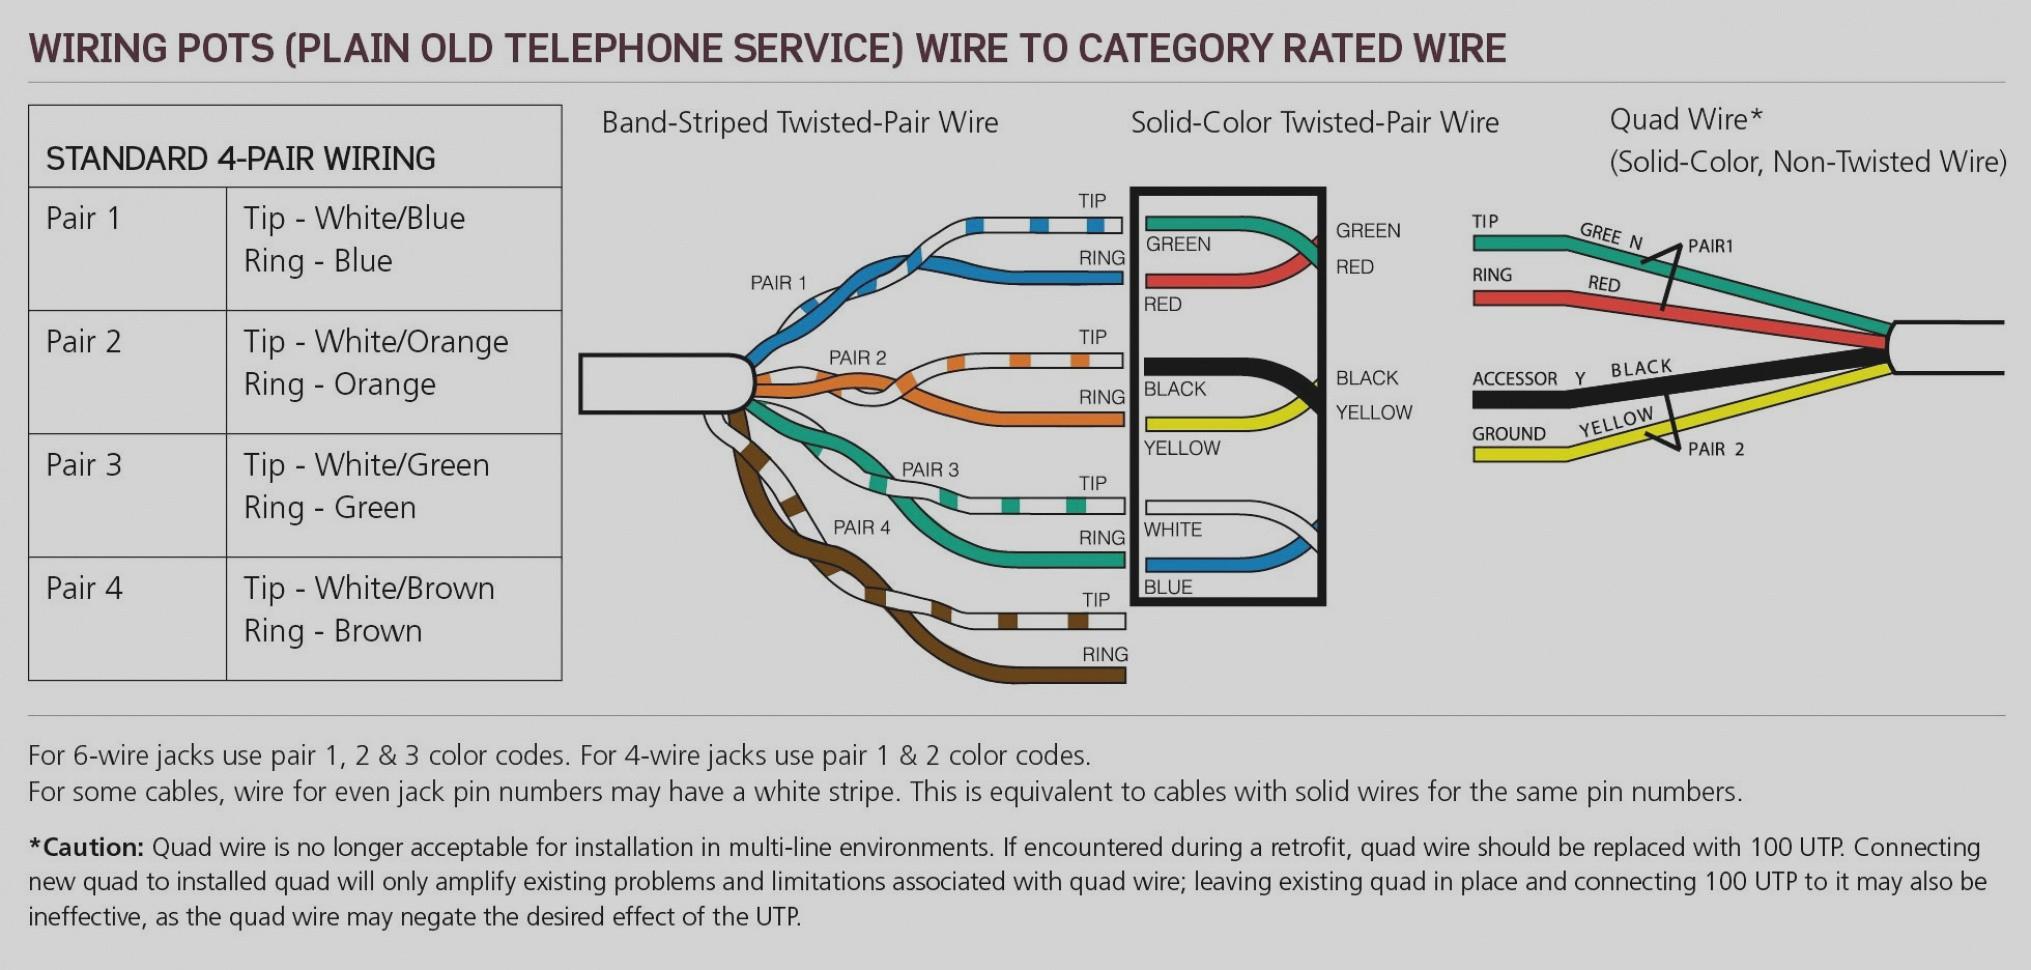 4 Pole Headphone Jack Turtle Beach Jack Wiring Diagram from 2020cadillac.com